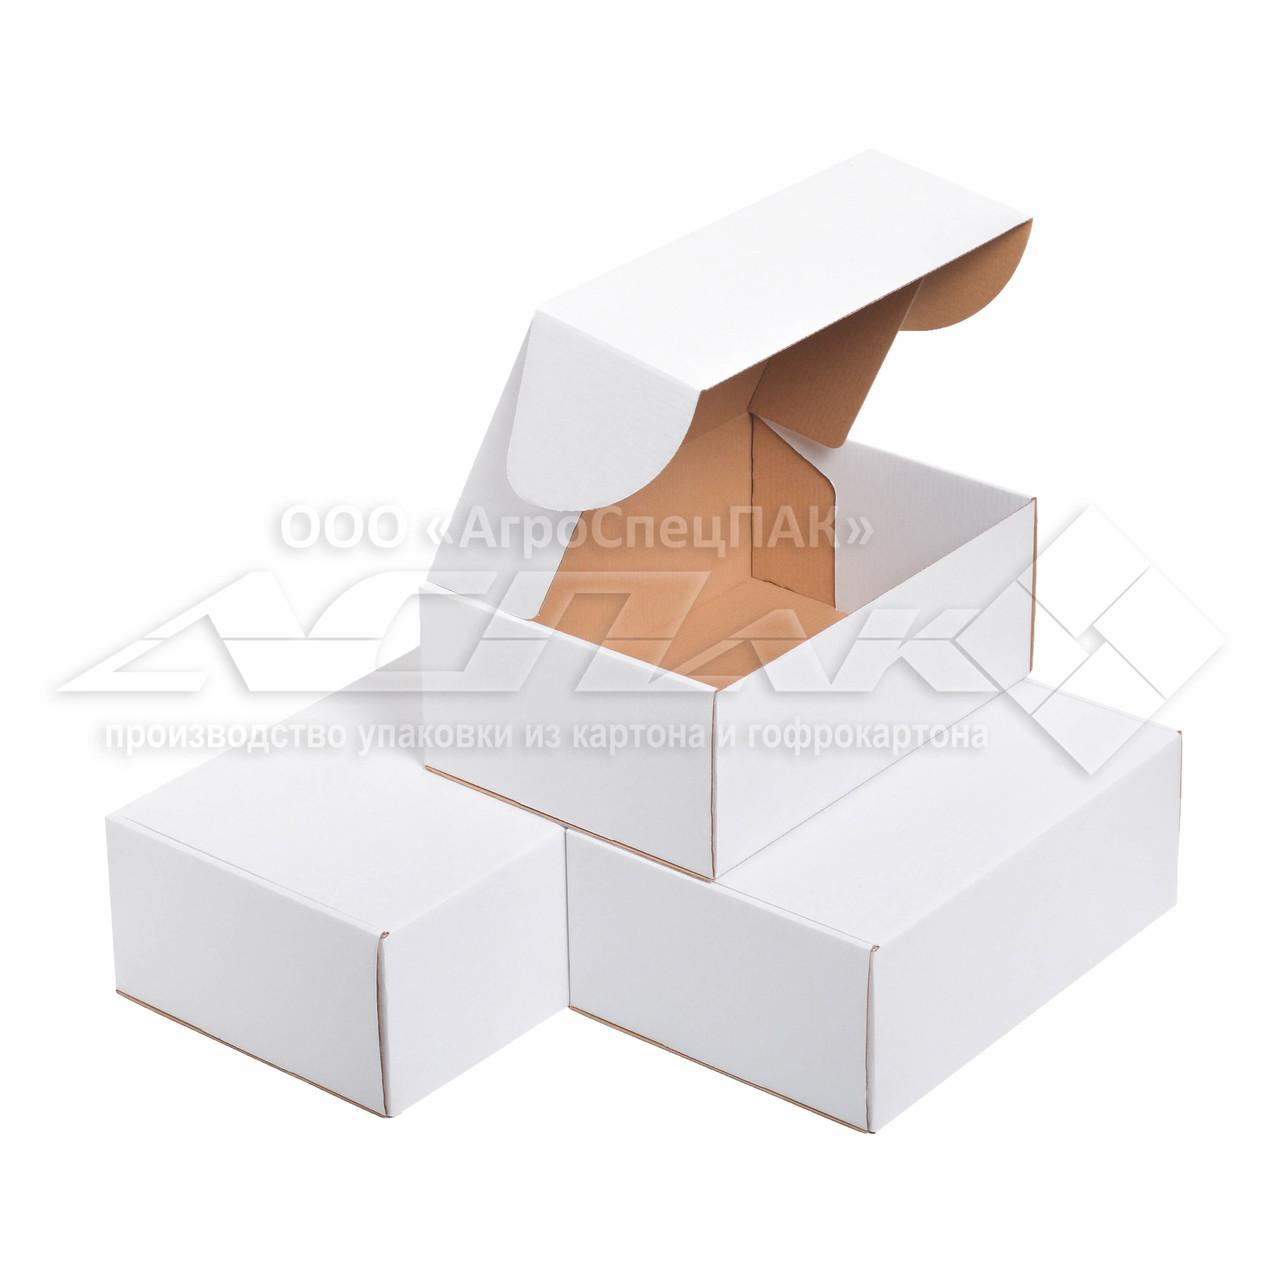 Картонная коробка 310х220х120 белая. Коробка формата А4.